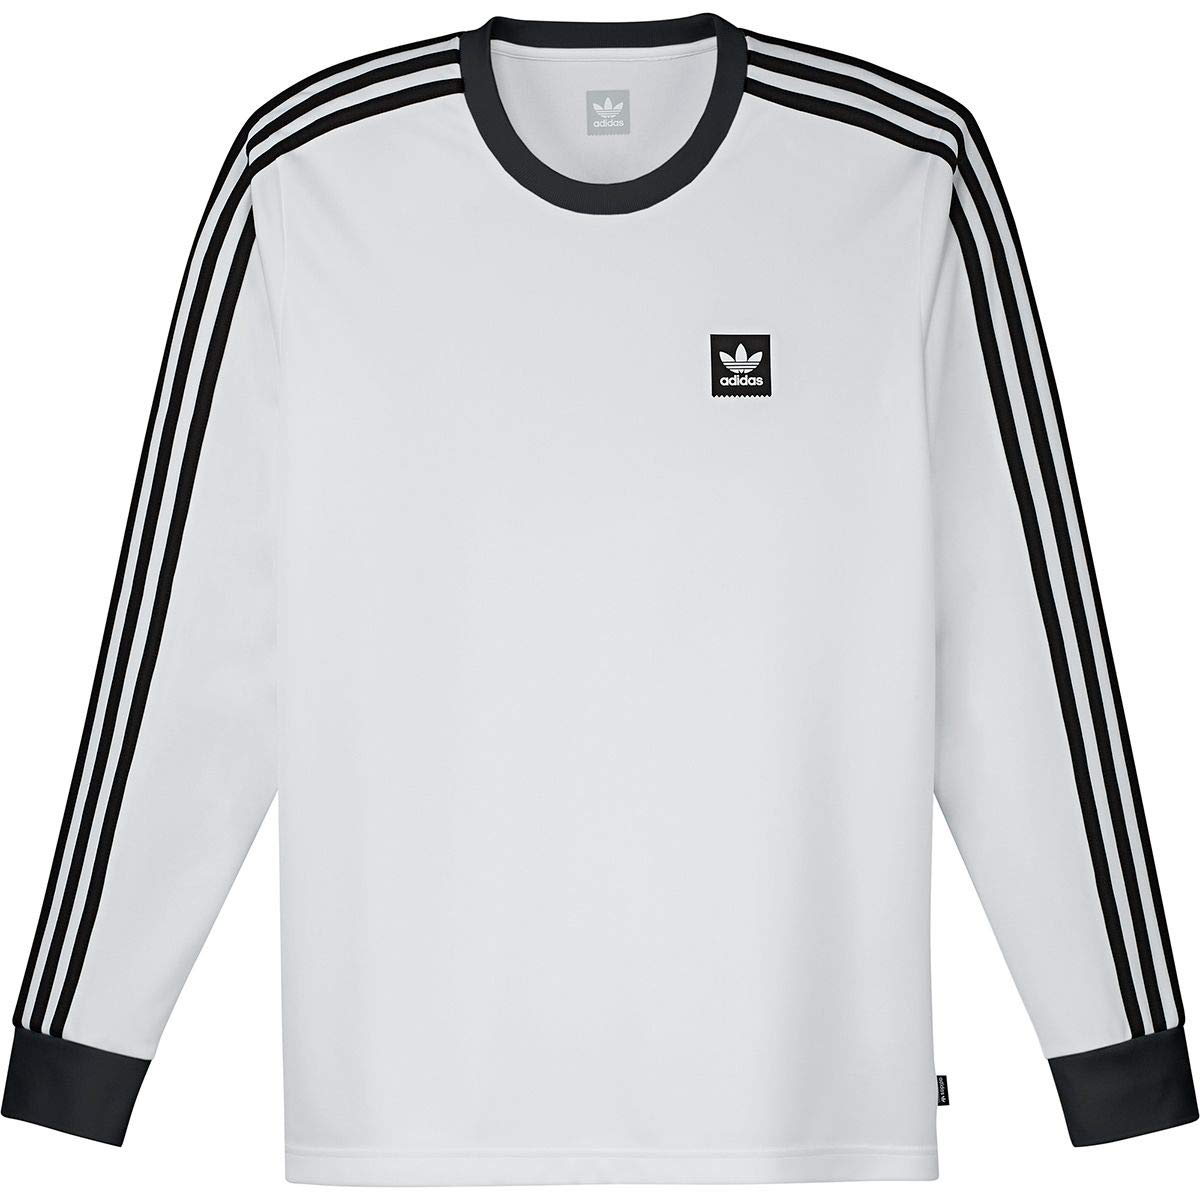 adidas M LS Club Jersey, White, X Large at Amazon Men's